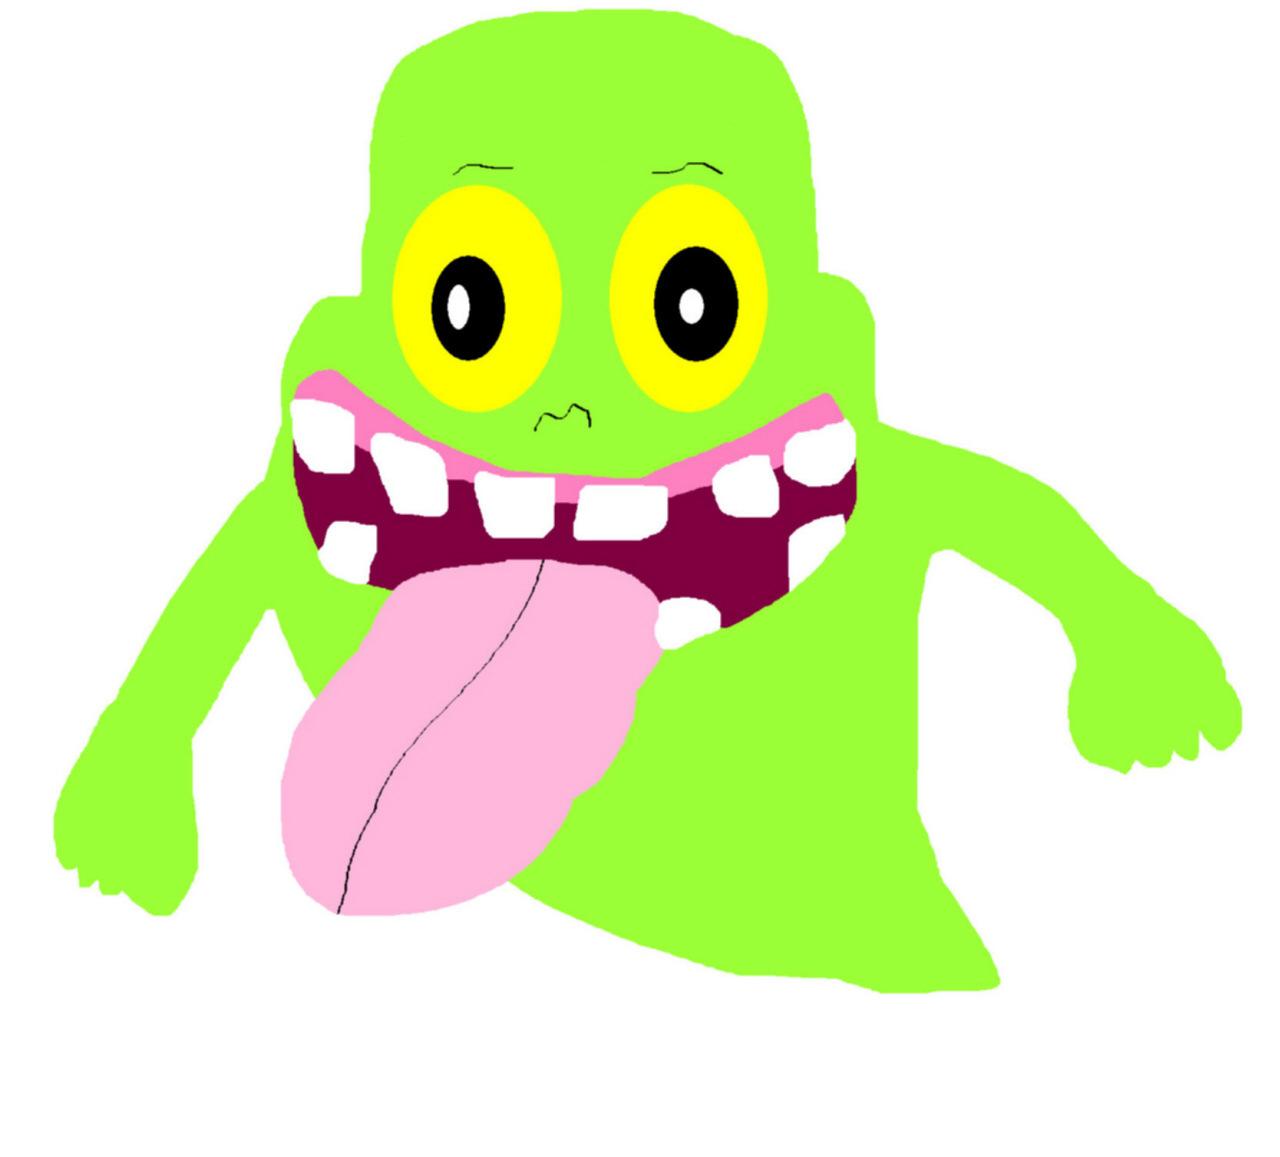 Random Slimer Creepy Face Ms Paint by Falconlobo